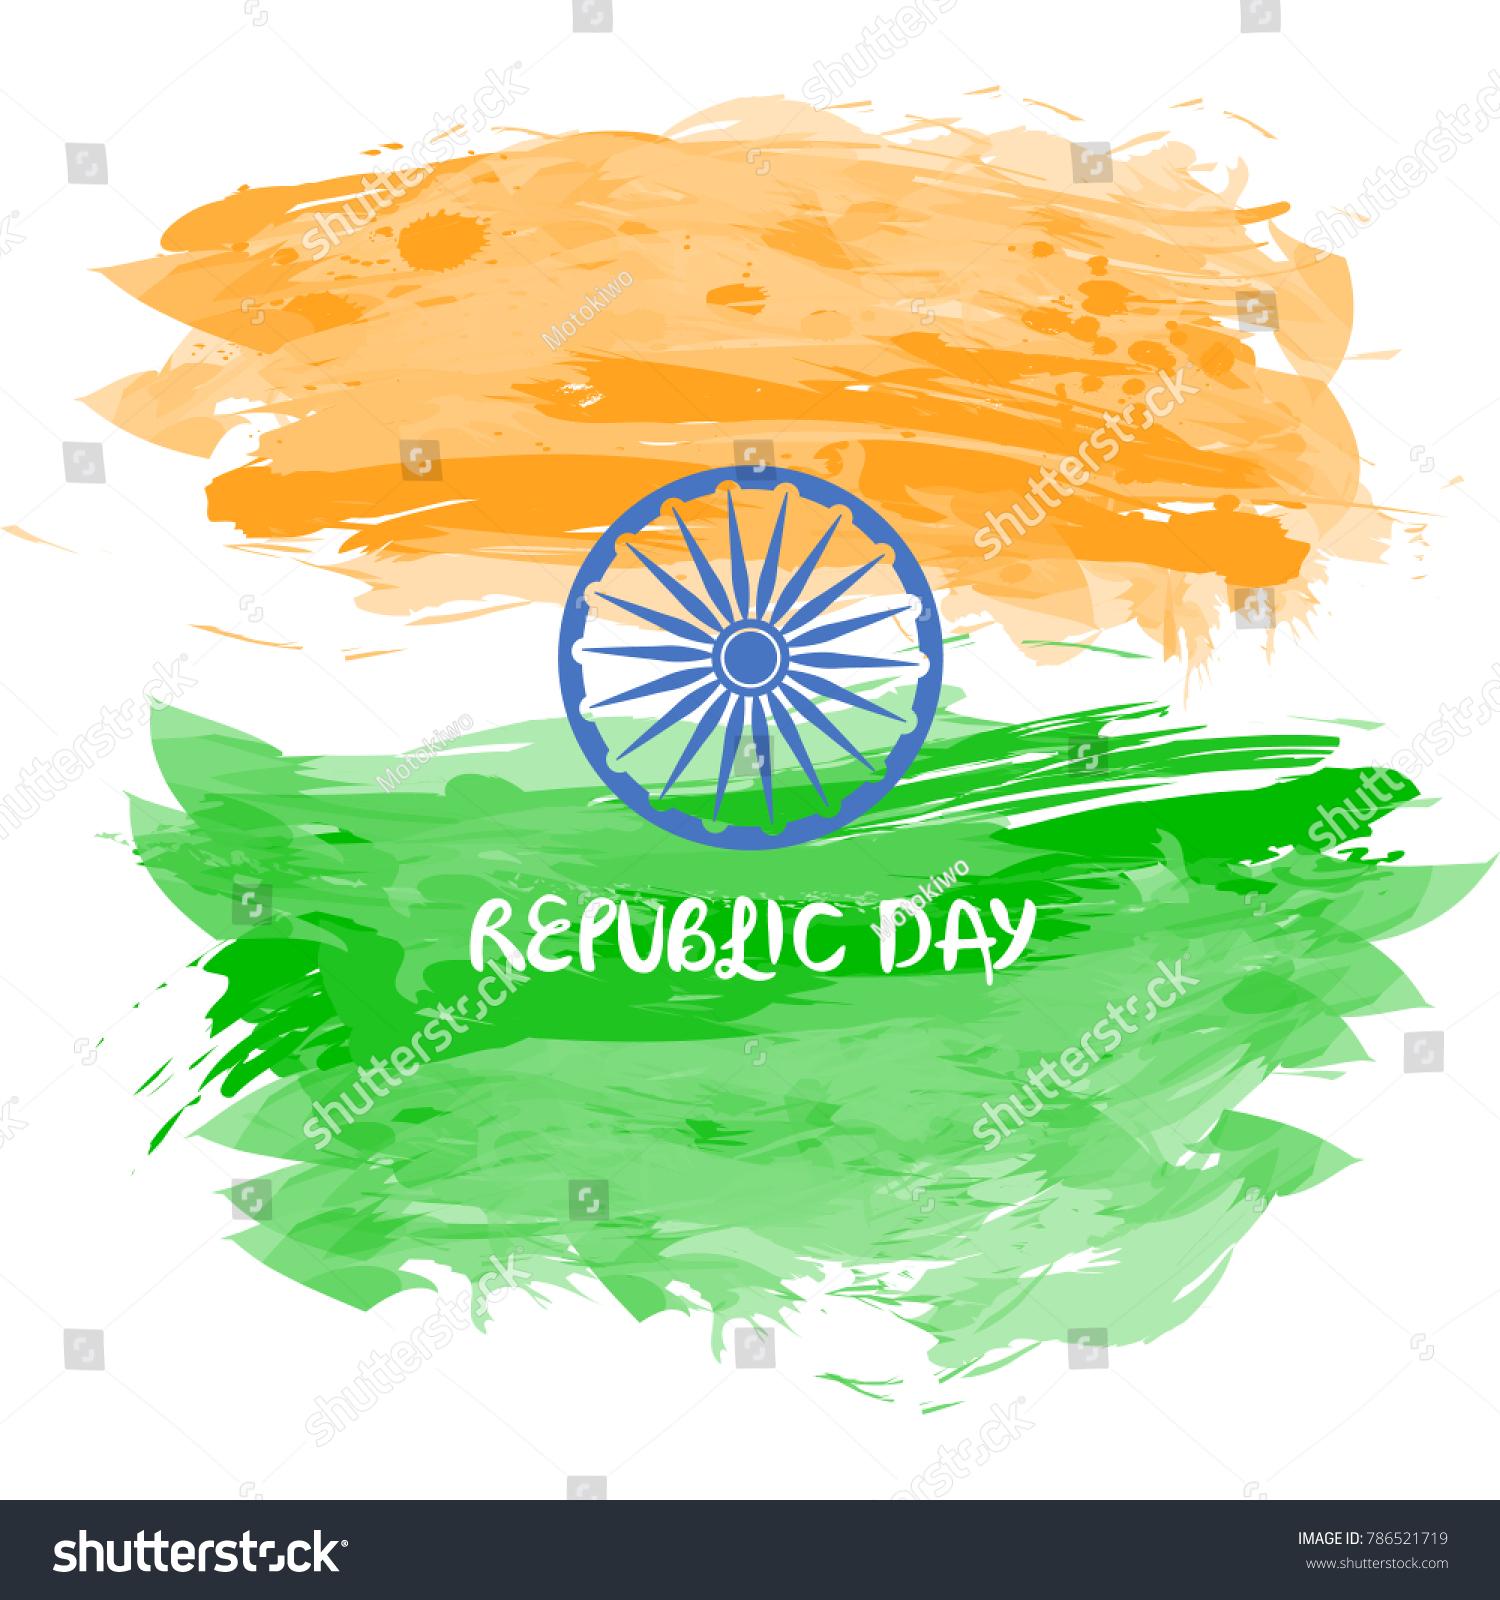 India Republic Day Greetings Watercolor Design Stock Vector